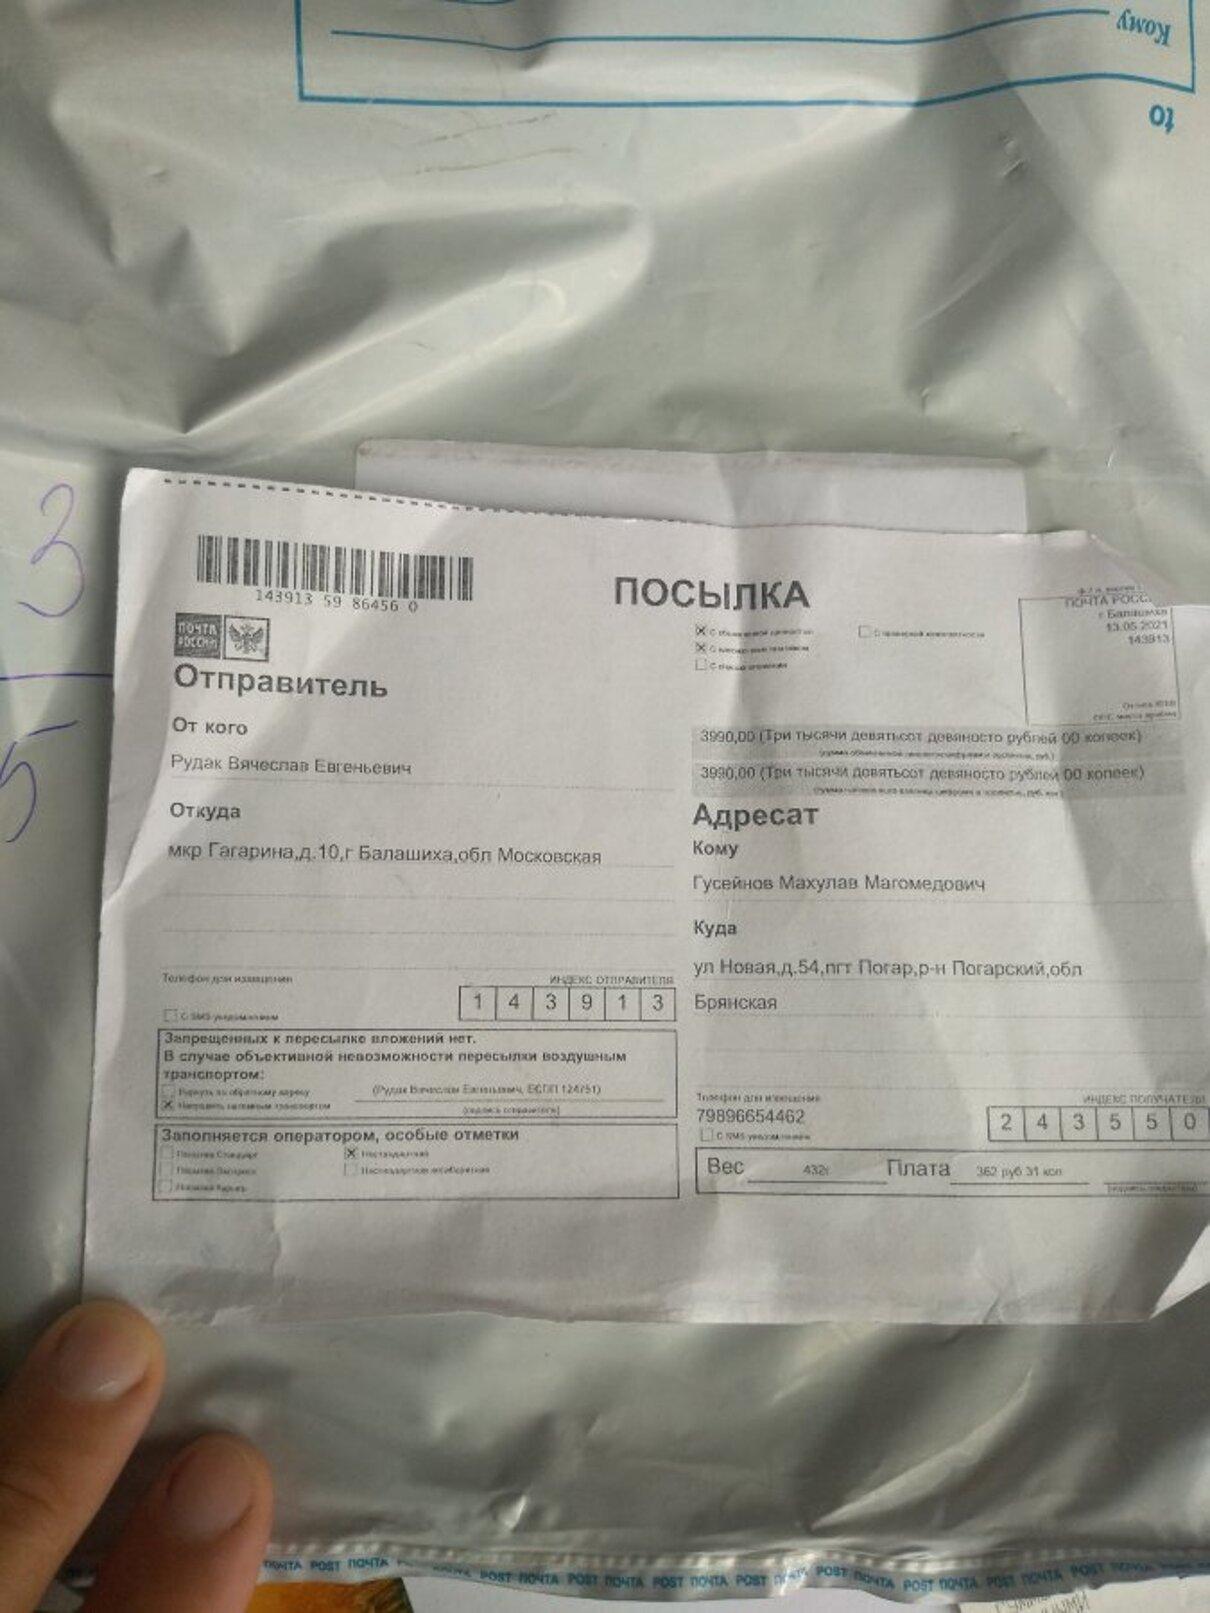 Жалоба-отзыв: Fujidvr.ru/5zWBspsk? site_source_name=insta - Товар не соответствует описанию.  Фото №2